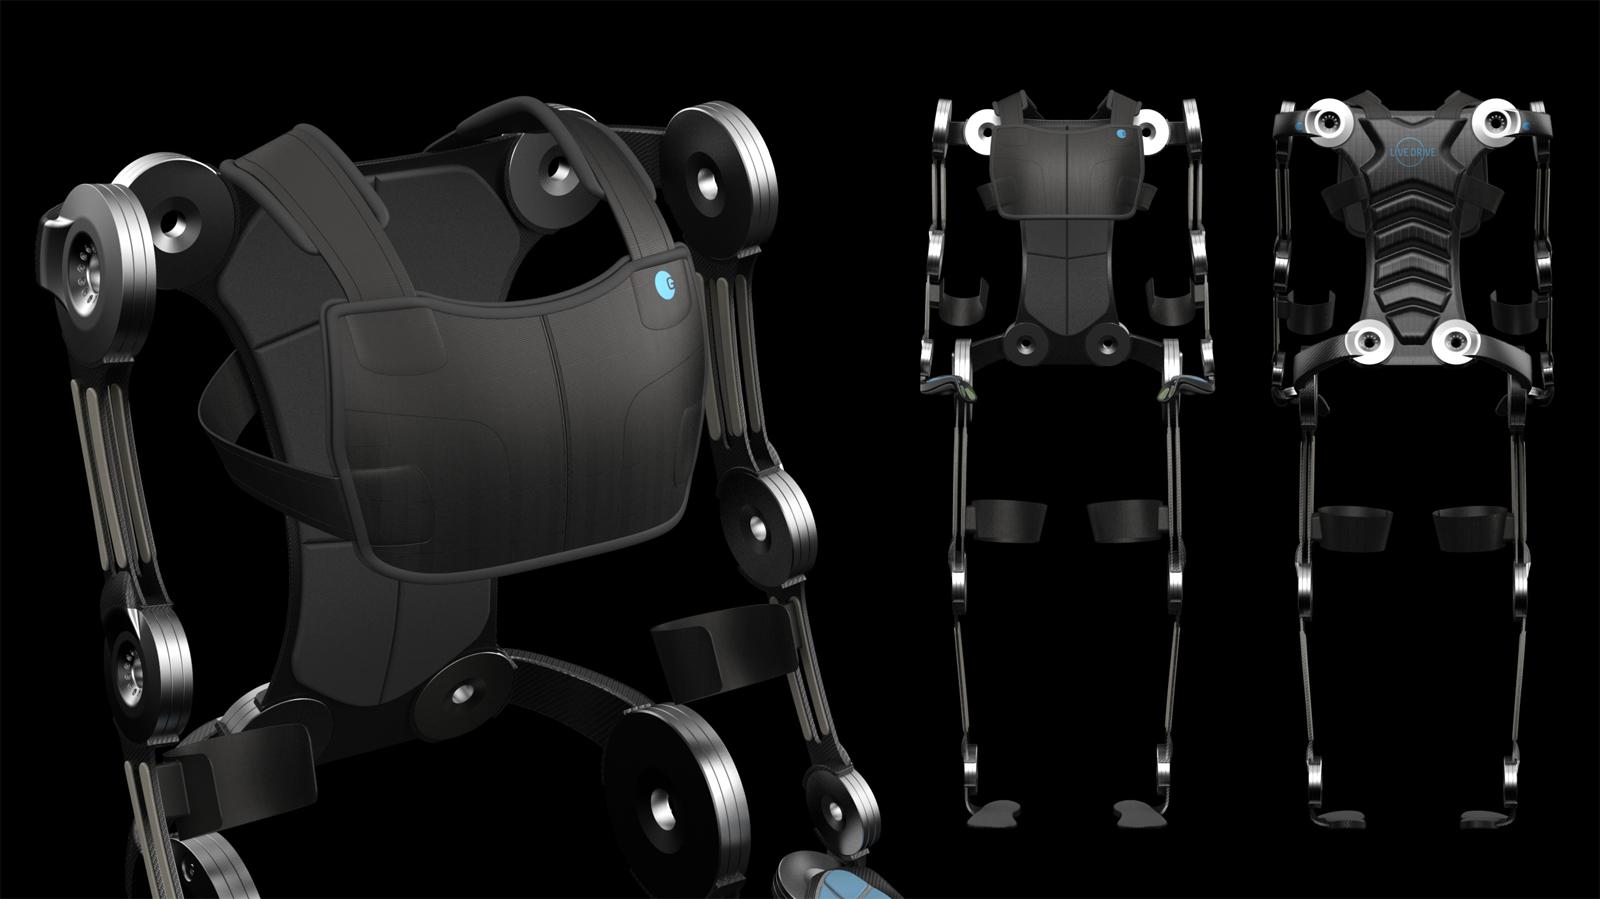 Genesis-Robotics